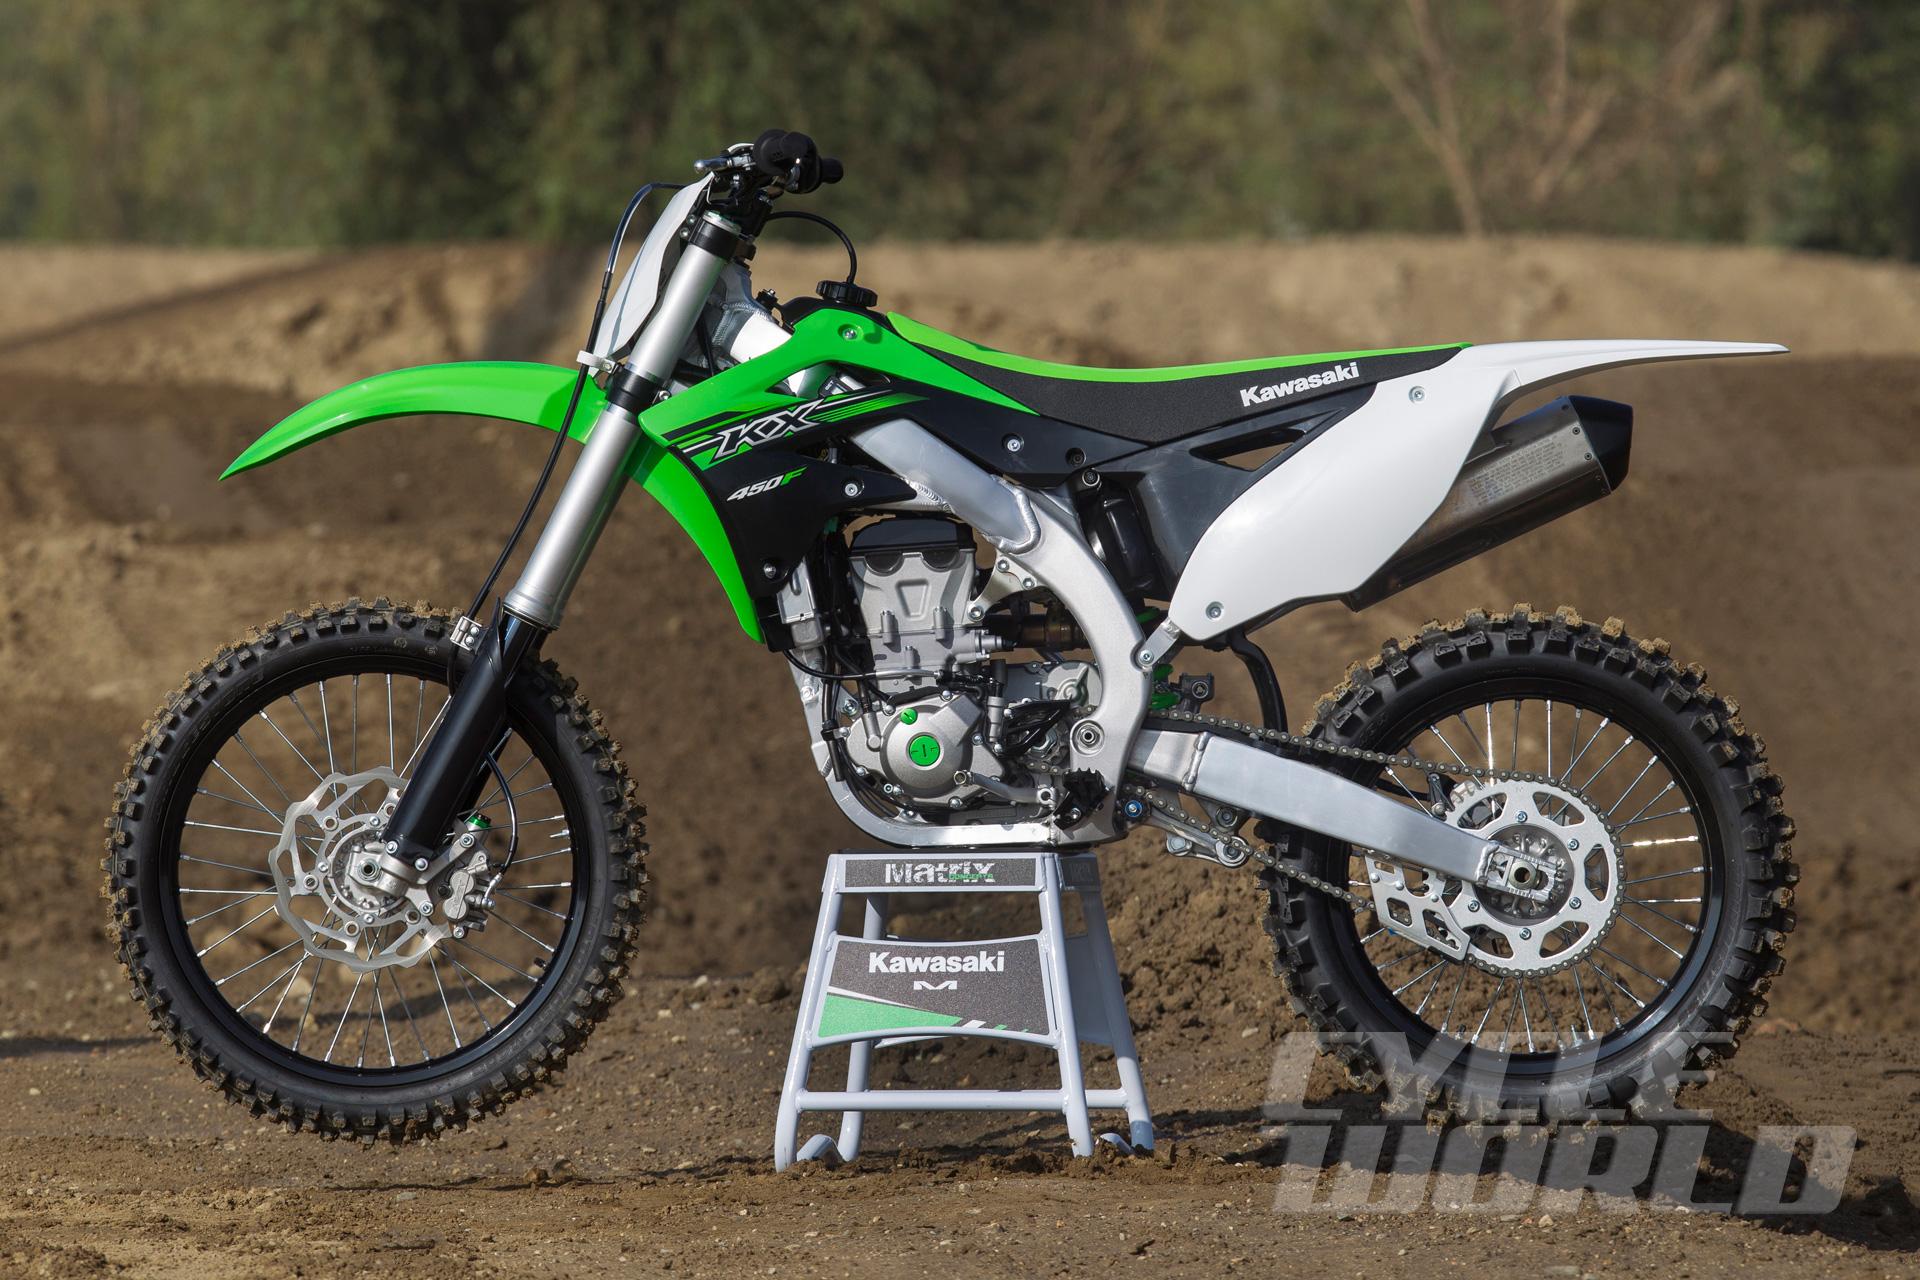 2015 Kawasaki KX450F- First Ride Dirt Bike Review- Photos